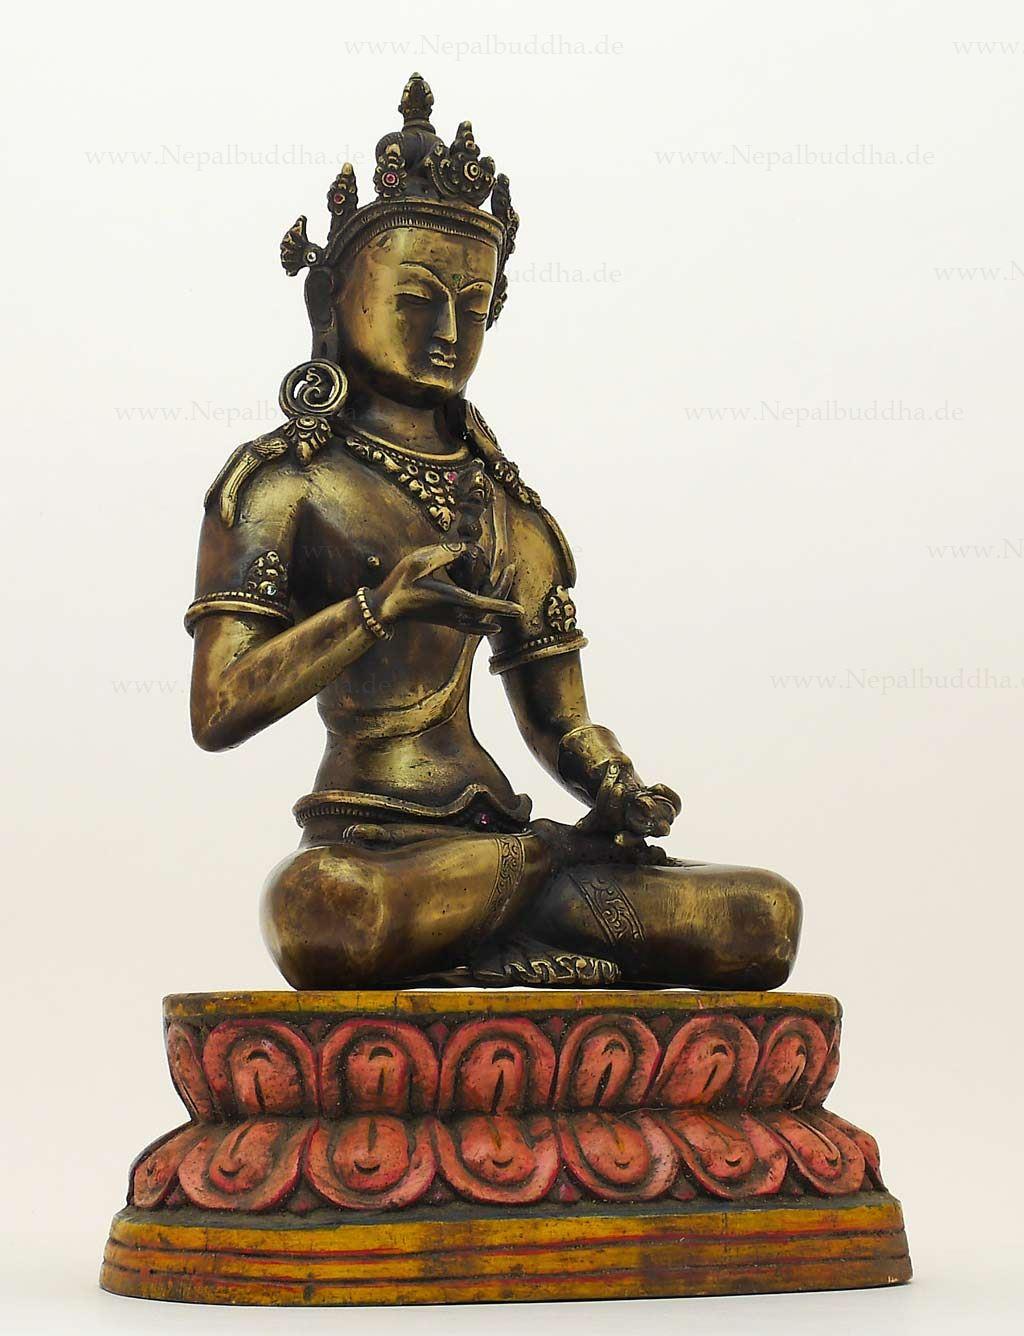 dorje sempa vajrasattva figur 3 05 kg buddhismus buddha handicraft bronze nepal ebay. Black Bedroom Furniture Sets. Home Design Ideas